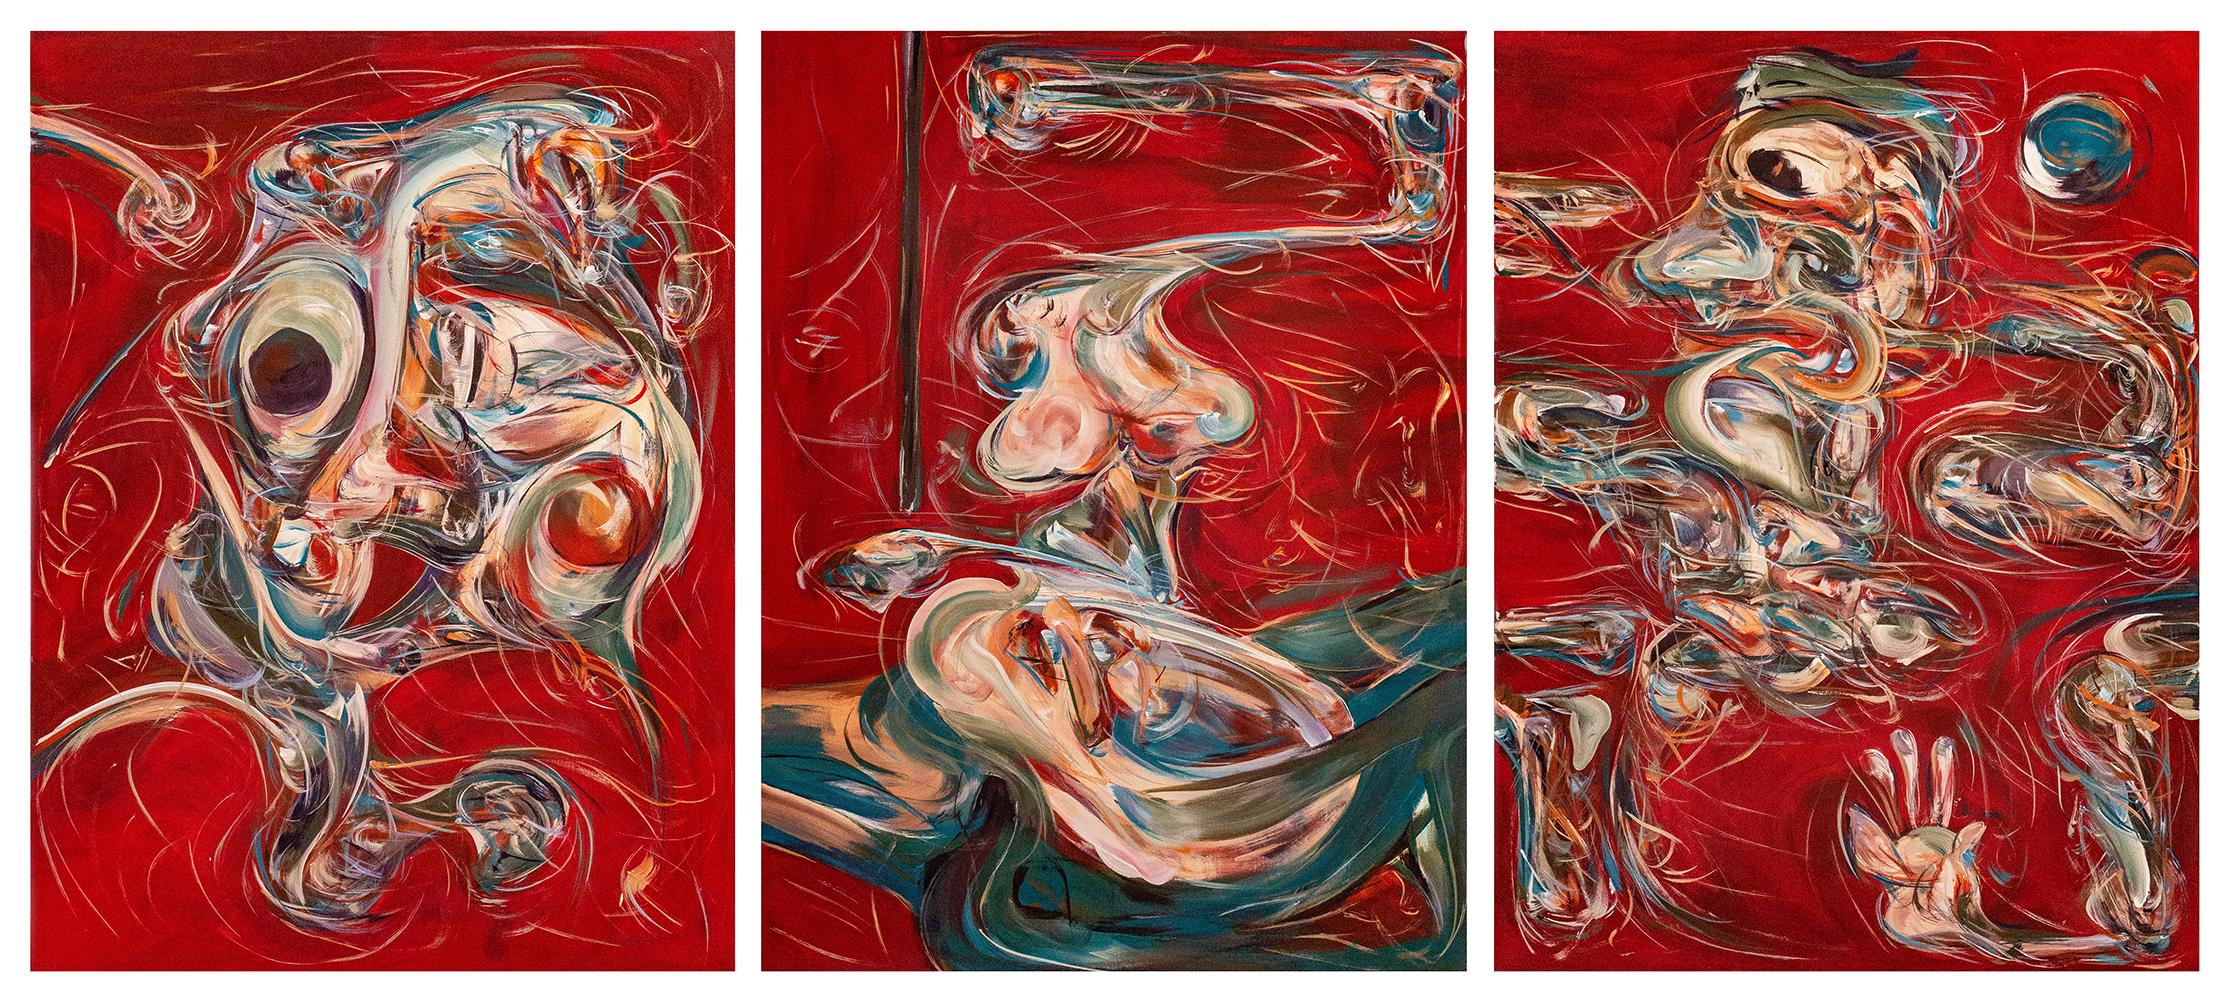 Yuan Fang,  Self-Portrait Triptych , 2018. Acrylic on canvas, 40 x 30 inches each. ©Yuan Fang, courtesy Fou Gallery | 方媛, 三联自画像, 2018. 布面丙烯,每张101.6 x 76.2 cm. ©方媛,致谢否画廊